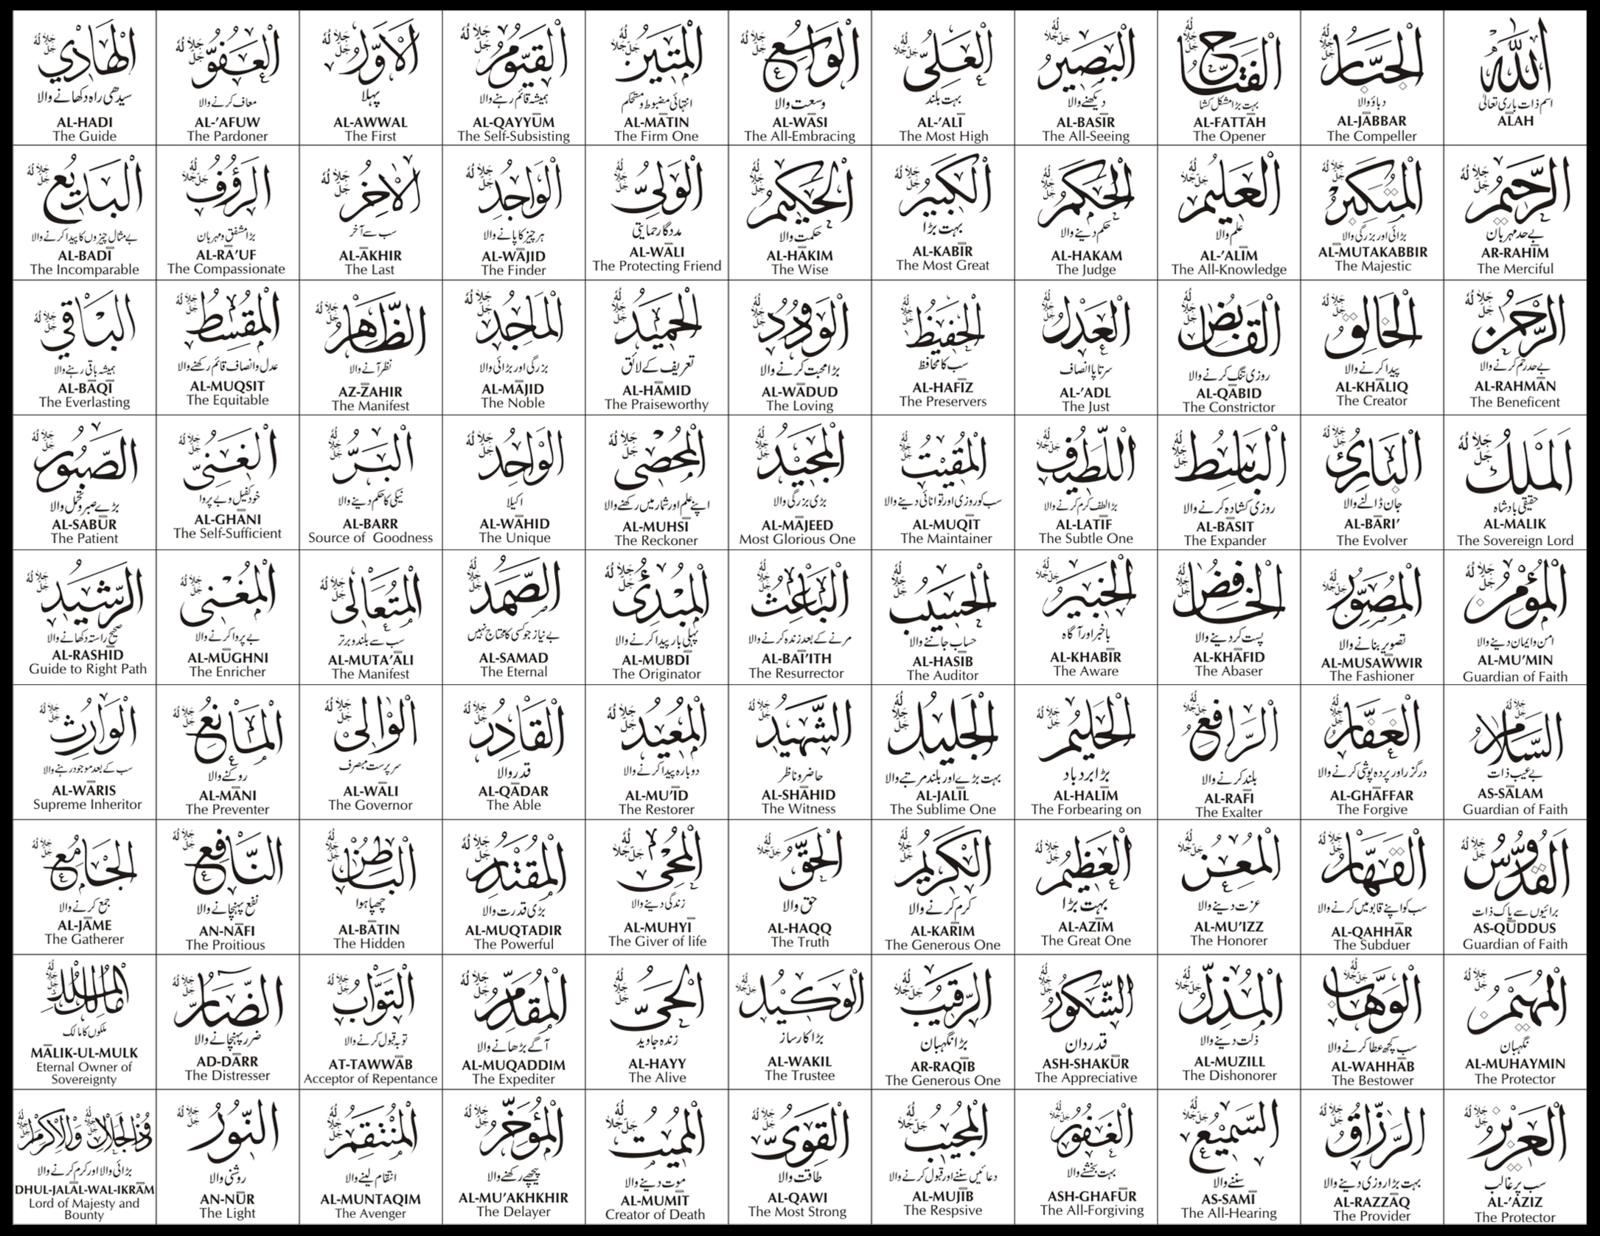 50 iGambari iKaligrafii iAsmauli iHusnai Terindah Fiqih Muslim